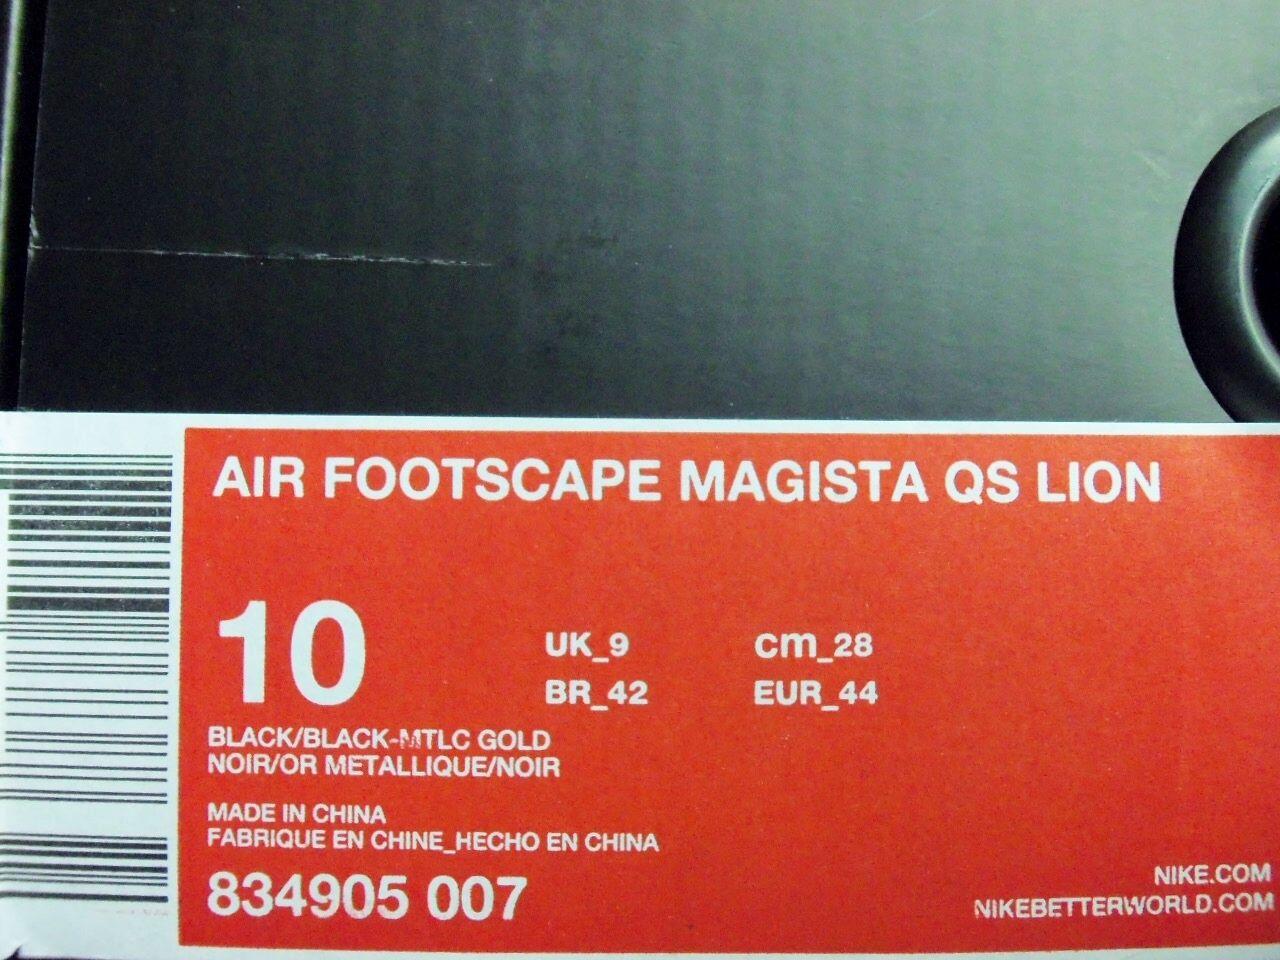 nike air größe footscape magista qs - löwe olivier rousteing größe air männer - 10 f1444d